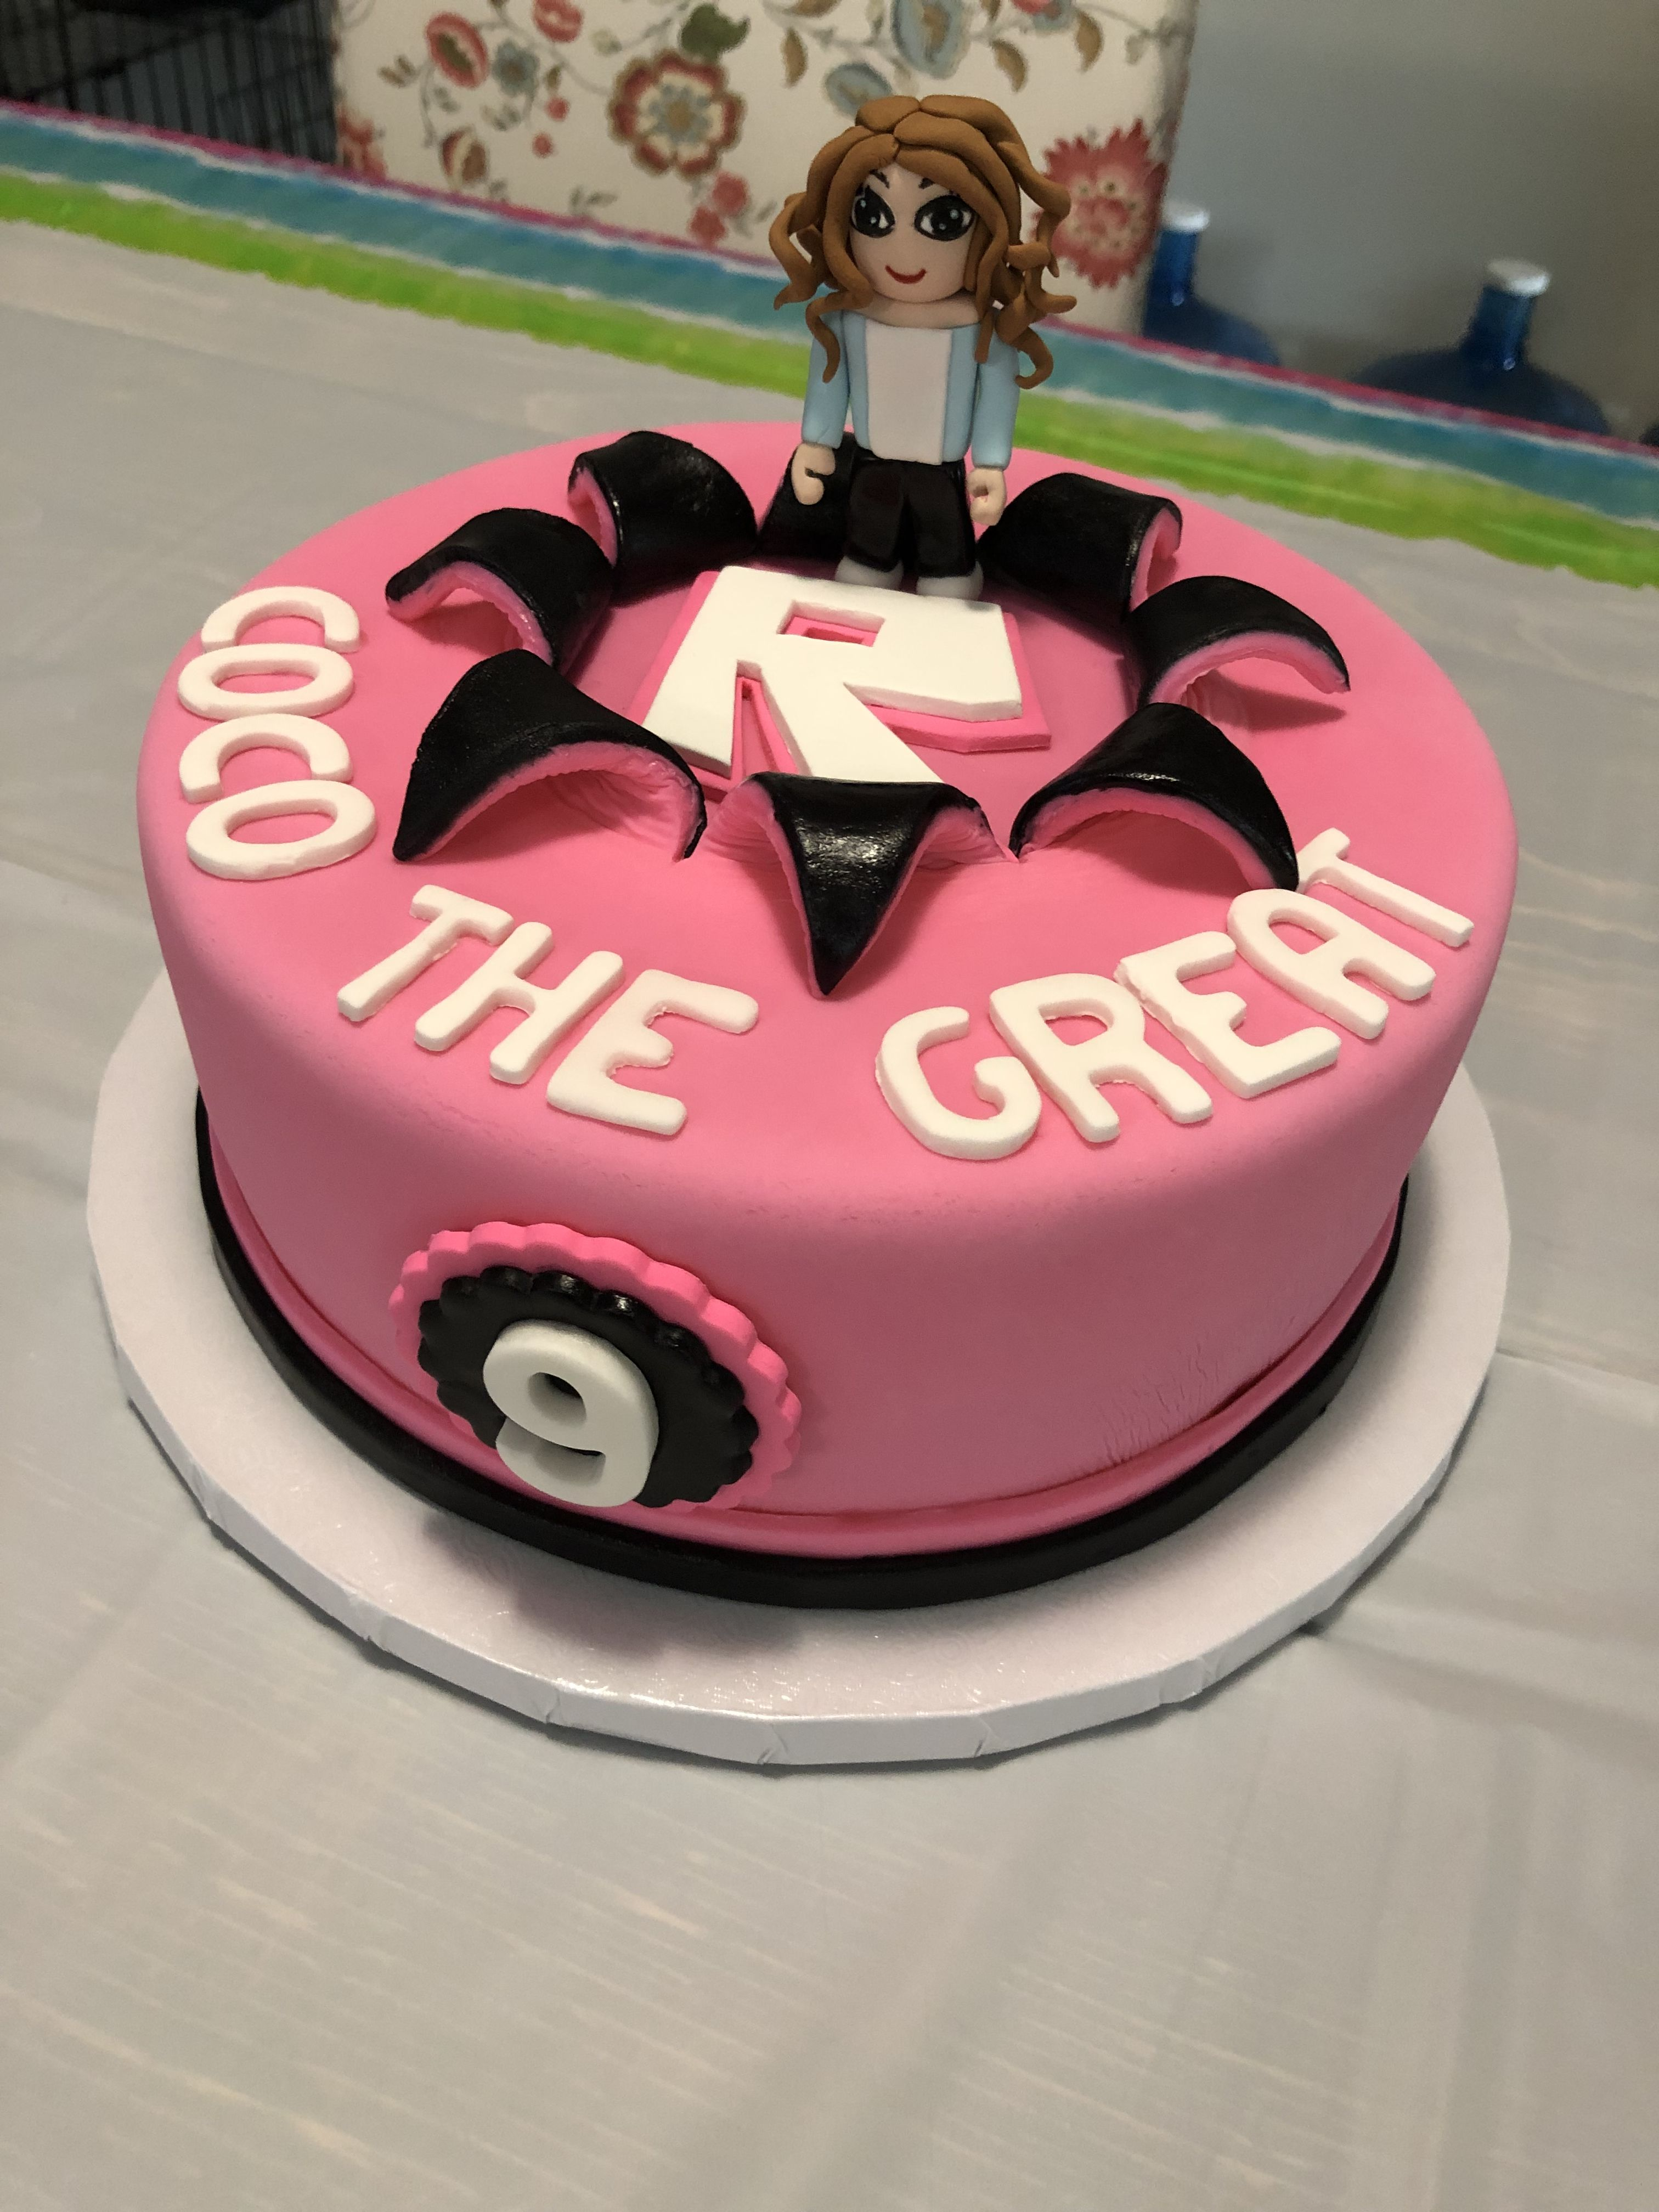 Roblox Cake For A Girl Roblox Cake Roblox Birthday Cake